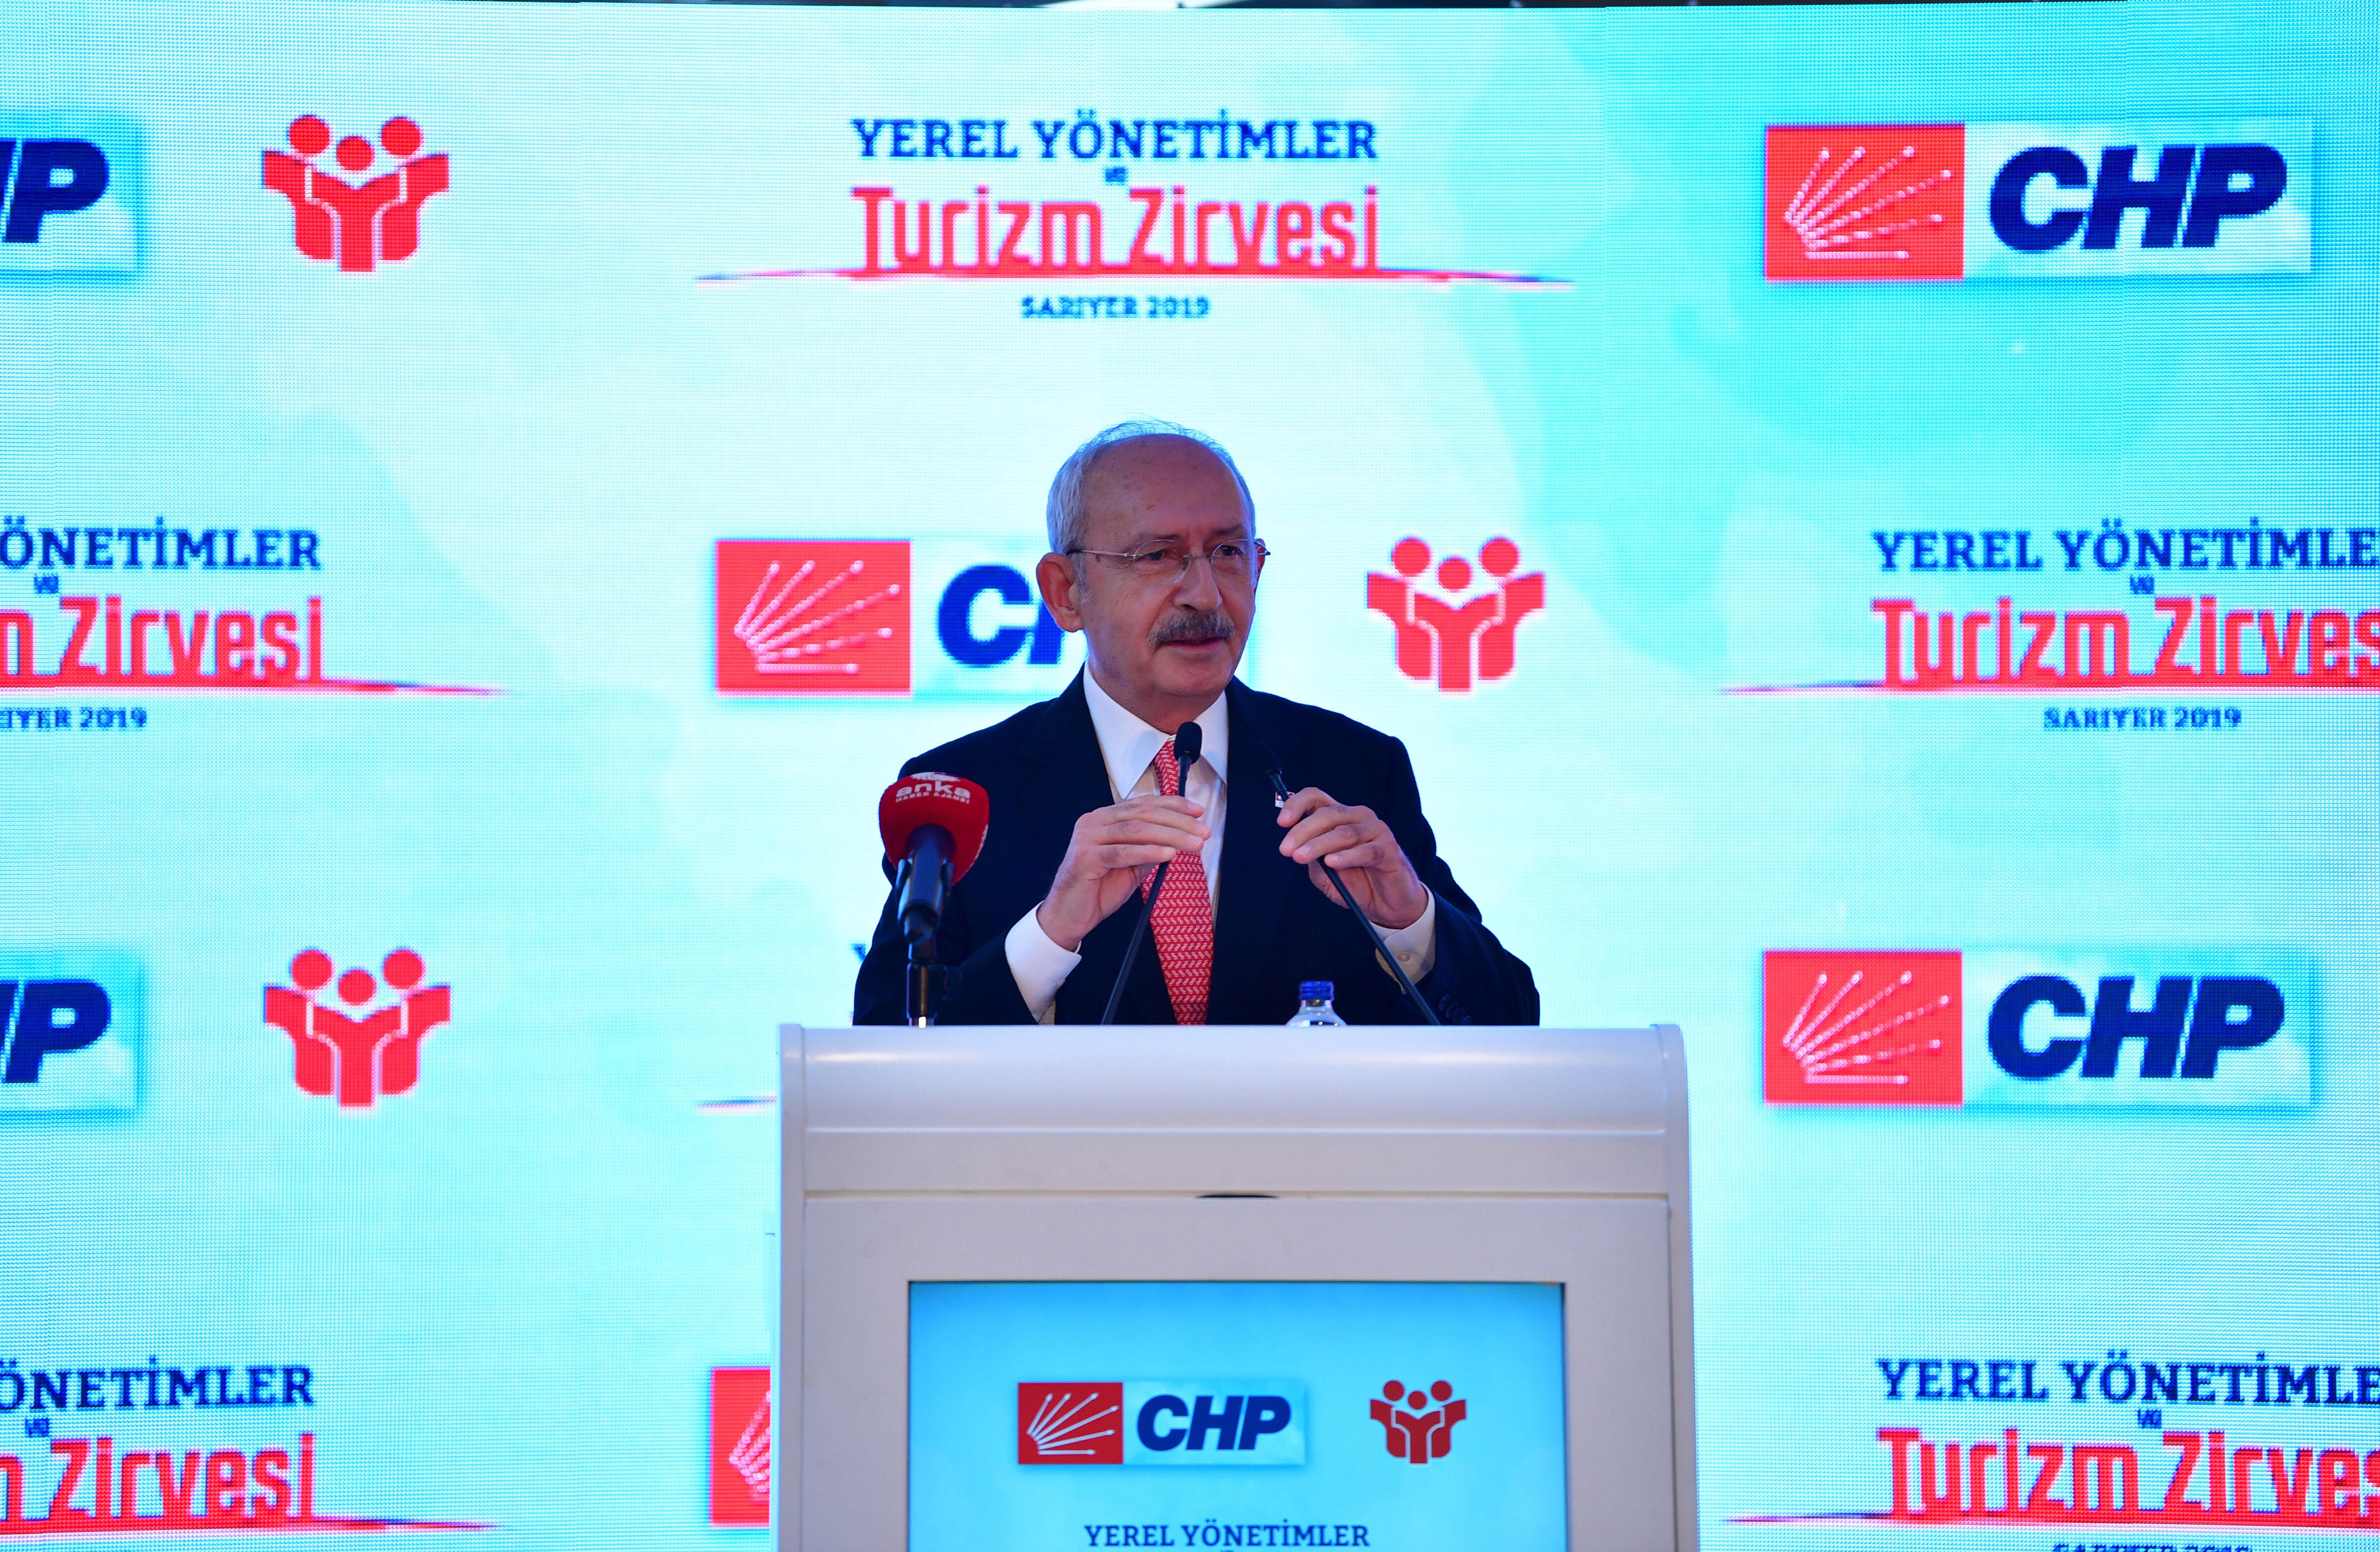 CHP'den Turizm zirvesi